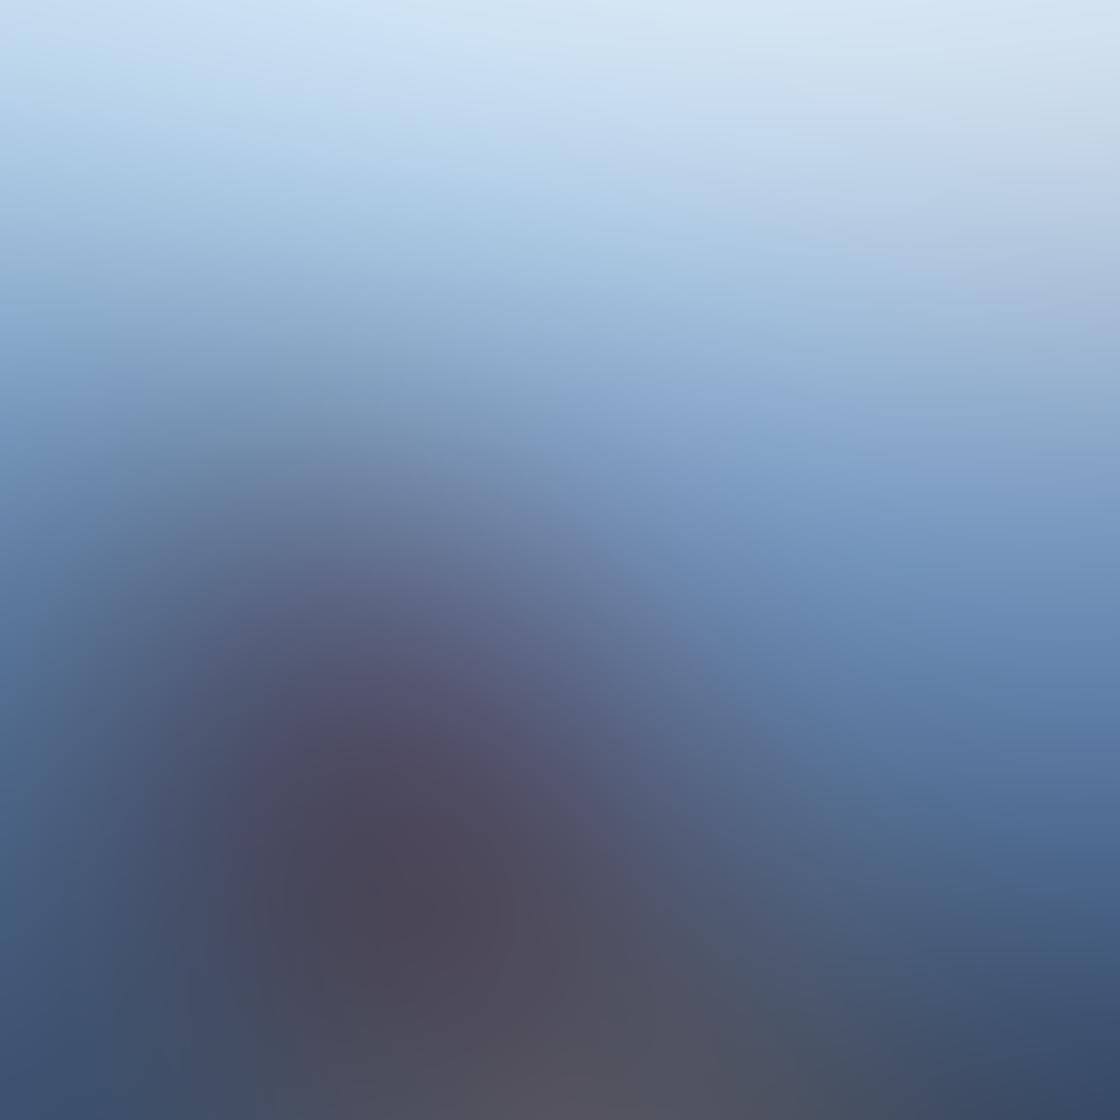 Minimalist Landscape iPhone Photos 12